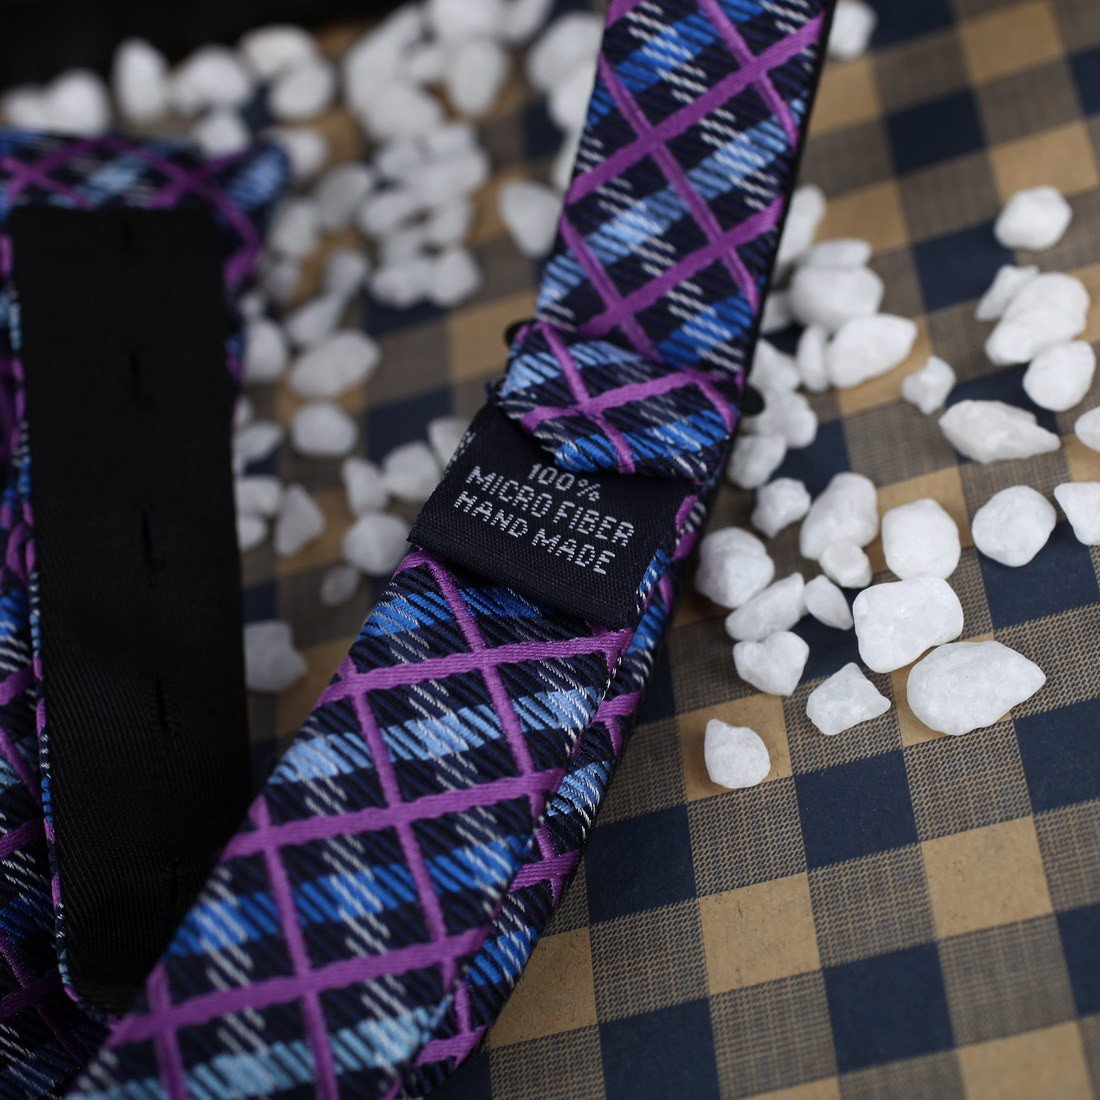 DBA7C04-06 Mens Checked Self-tied Bowtie Microfiber for Xmas Gift By Dan Smith